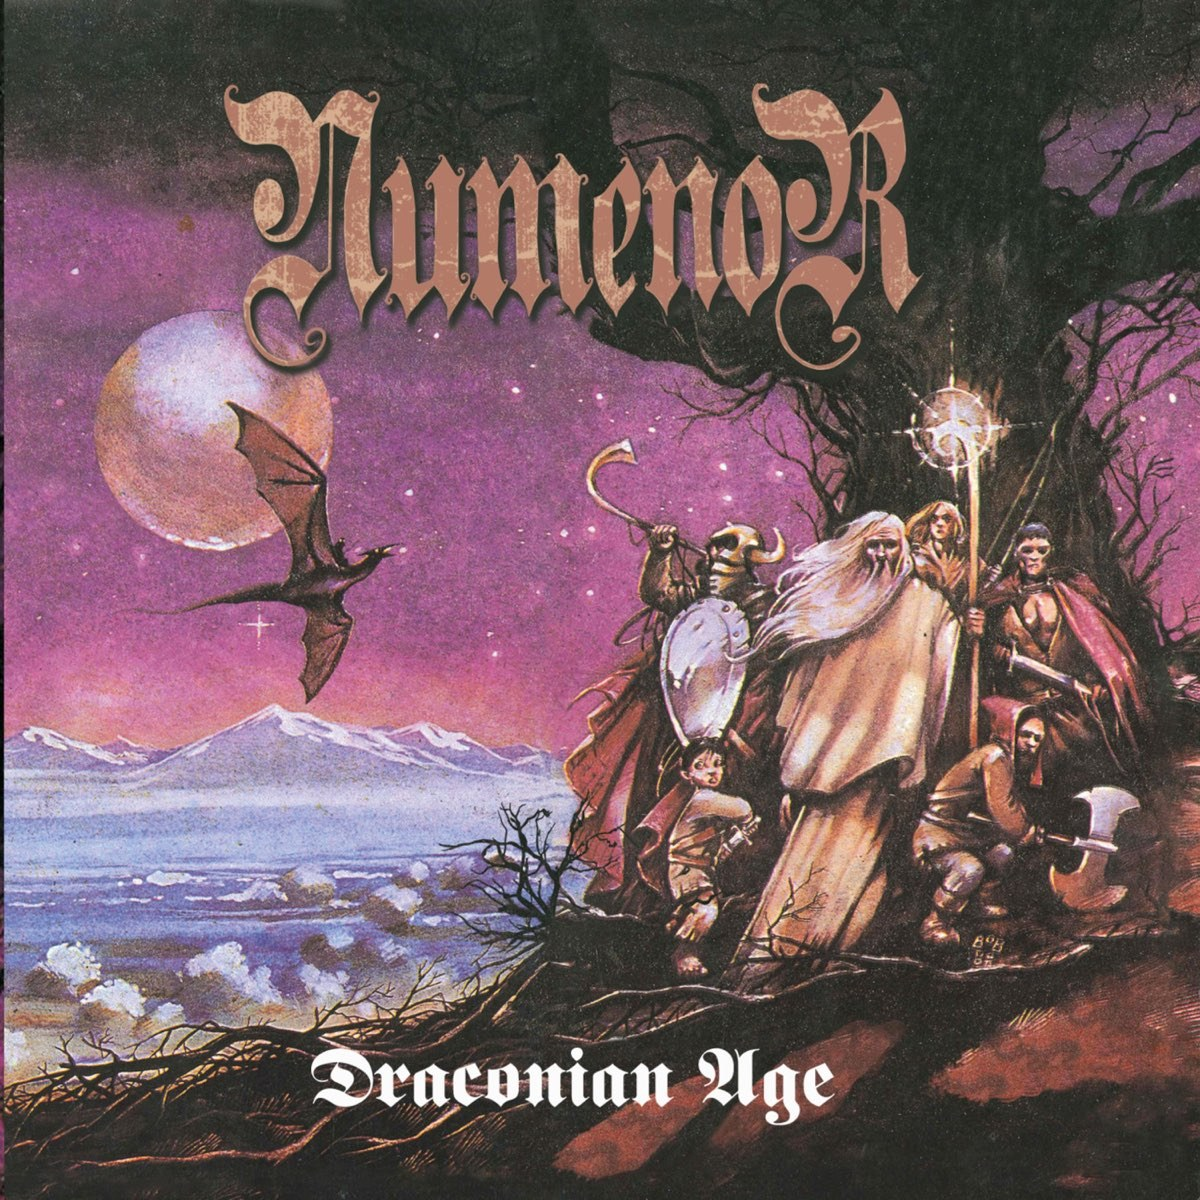 Reviews for Númenor - Draconian Age